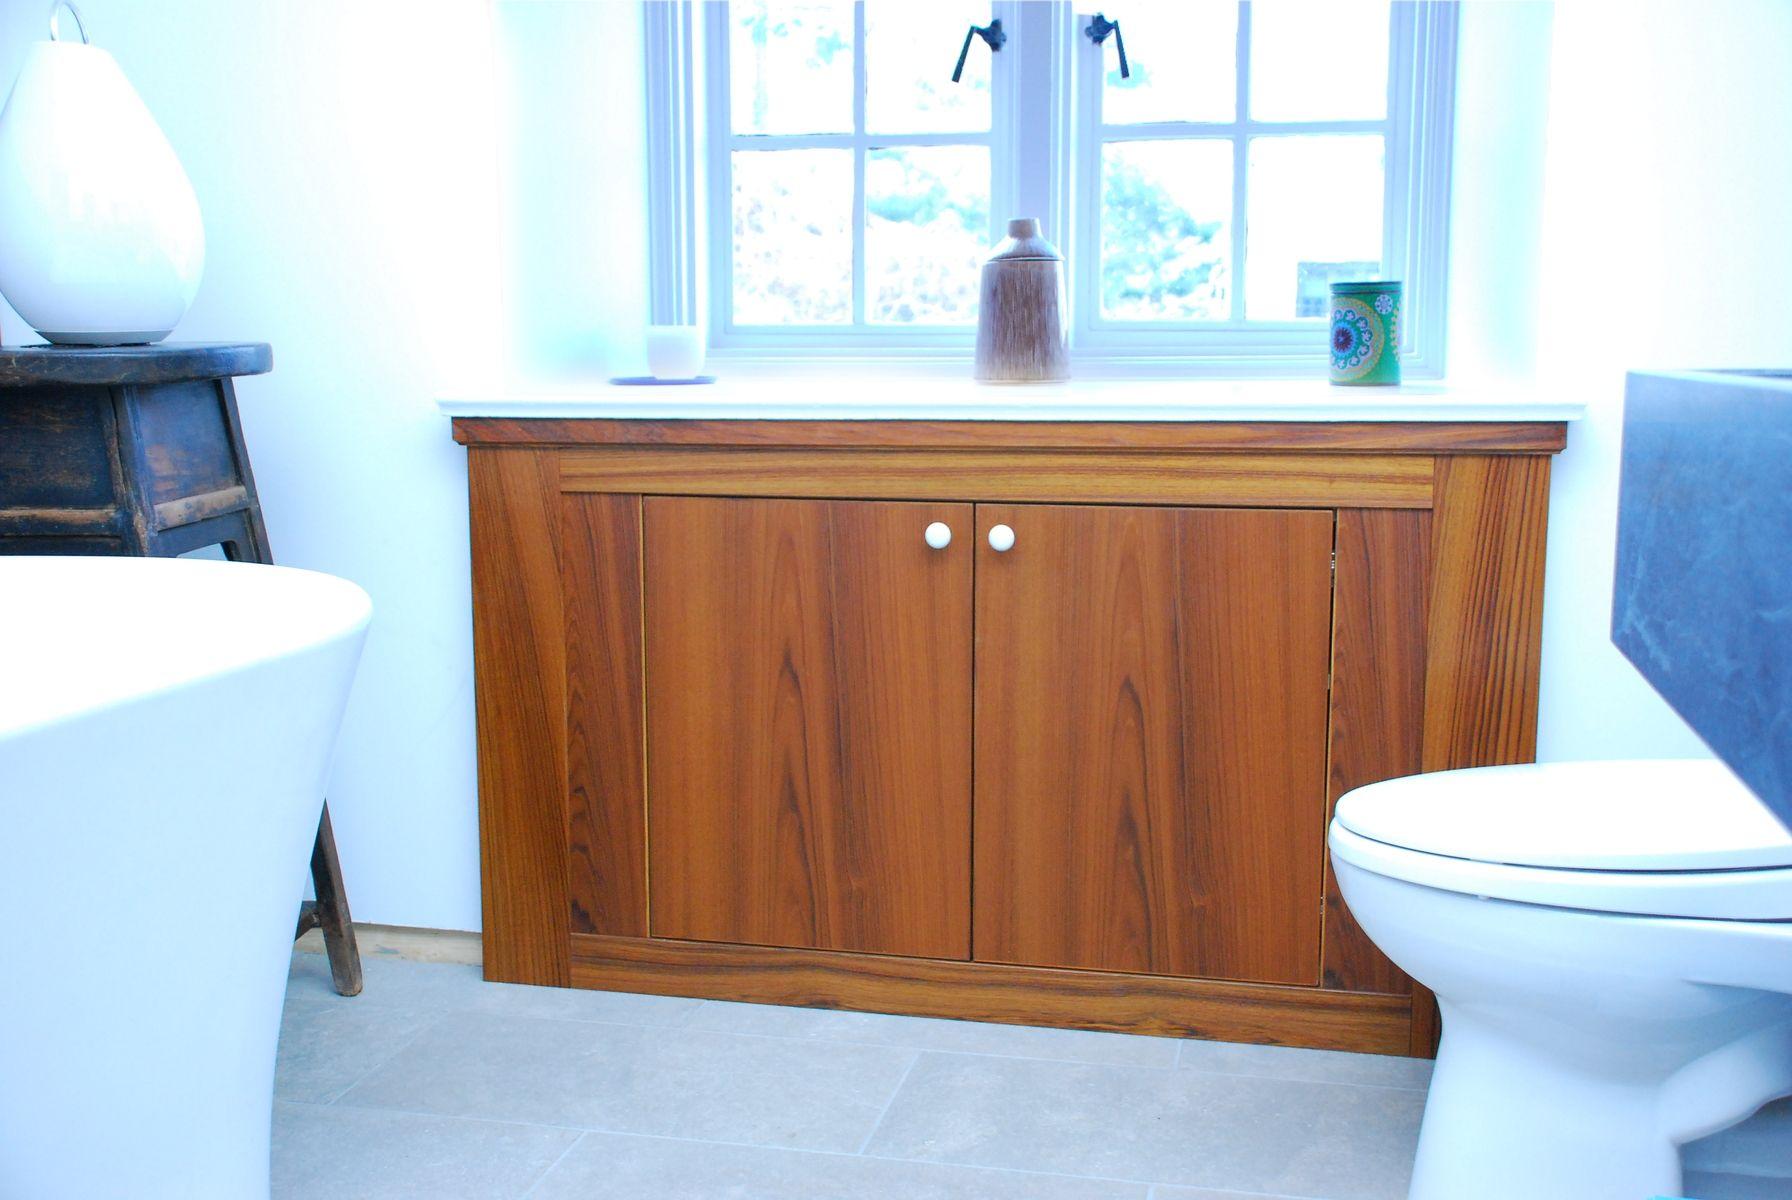 Hand Crafted Teak Bathroom Storage Cabinet By Furniture By Design - Teak bathroom cabinet storage